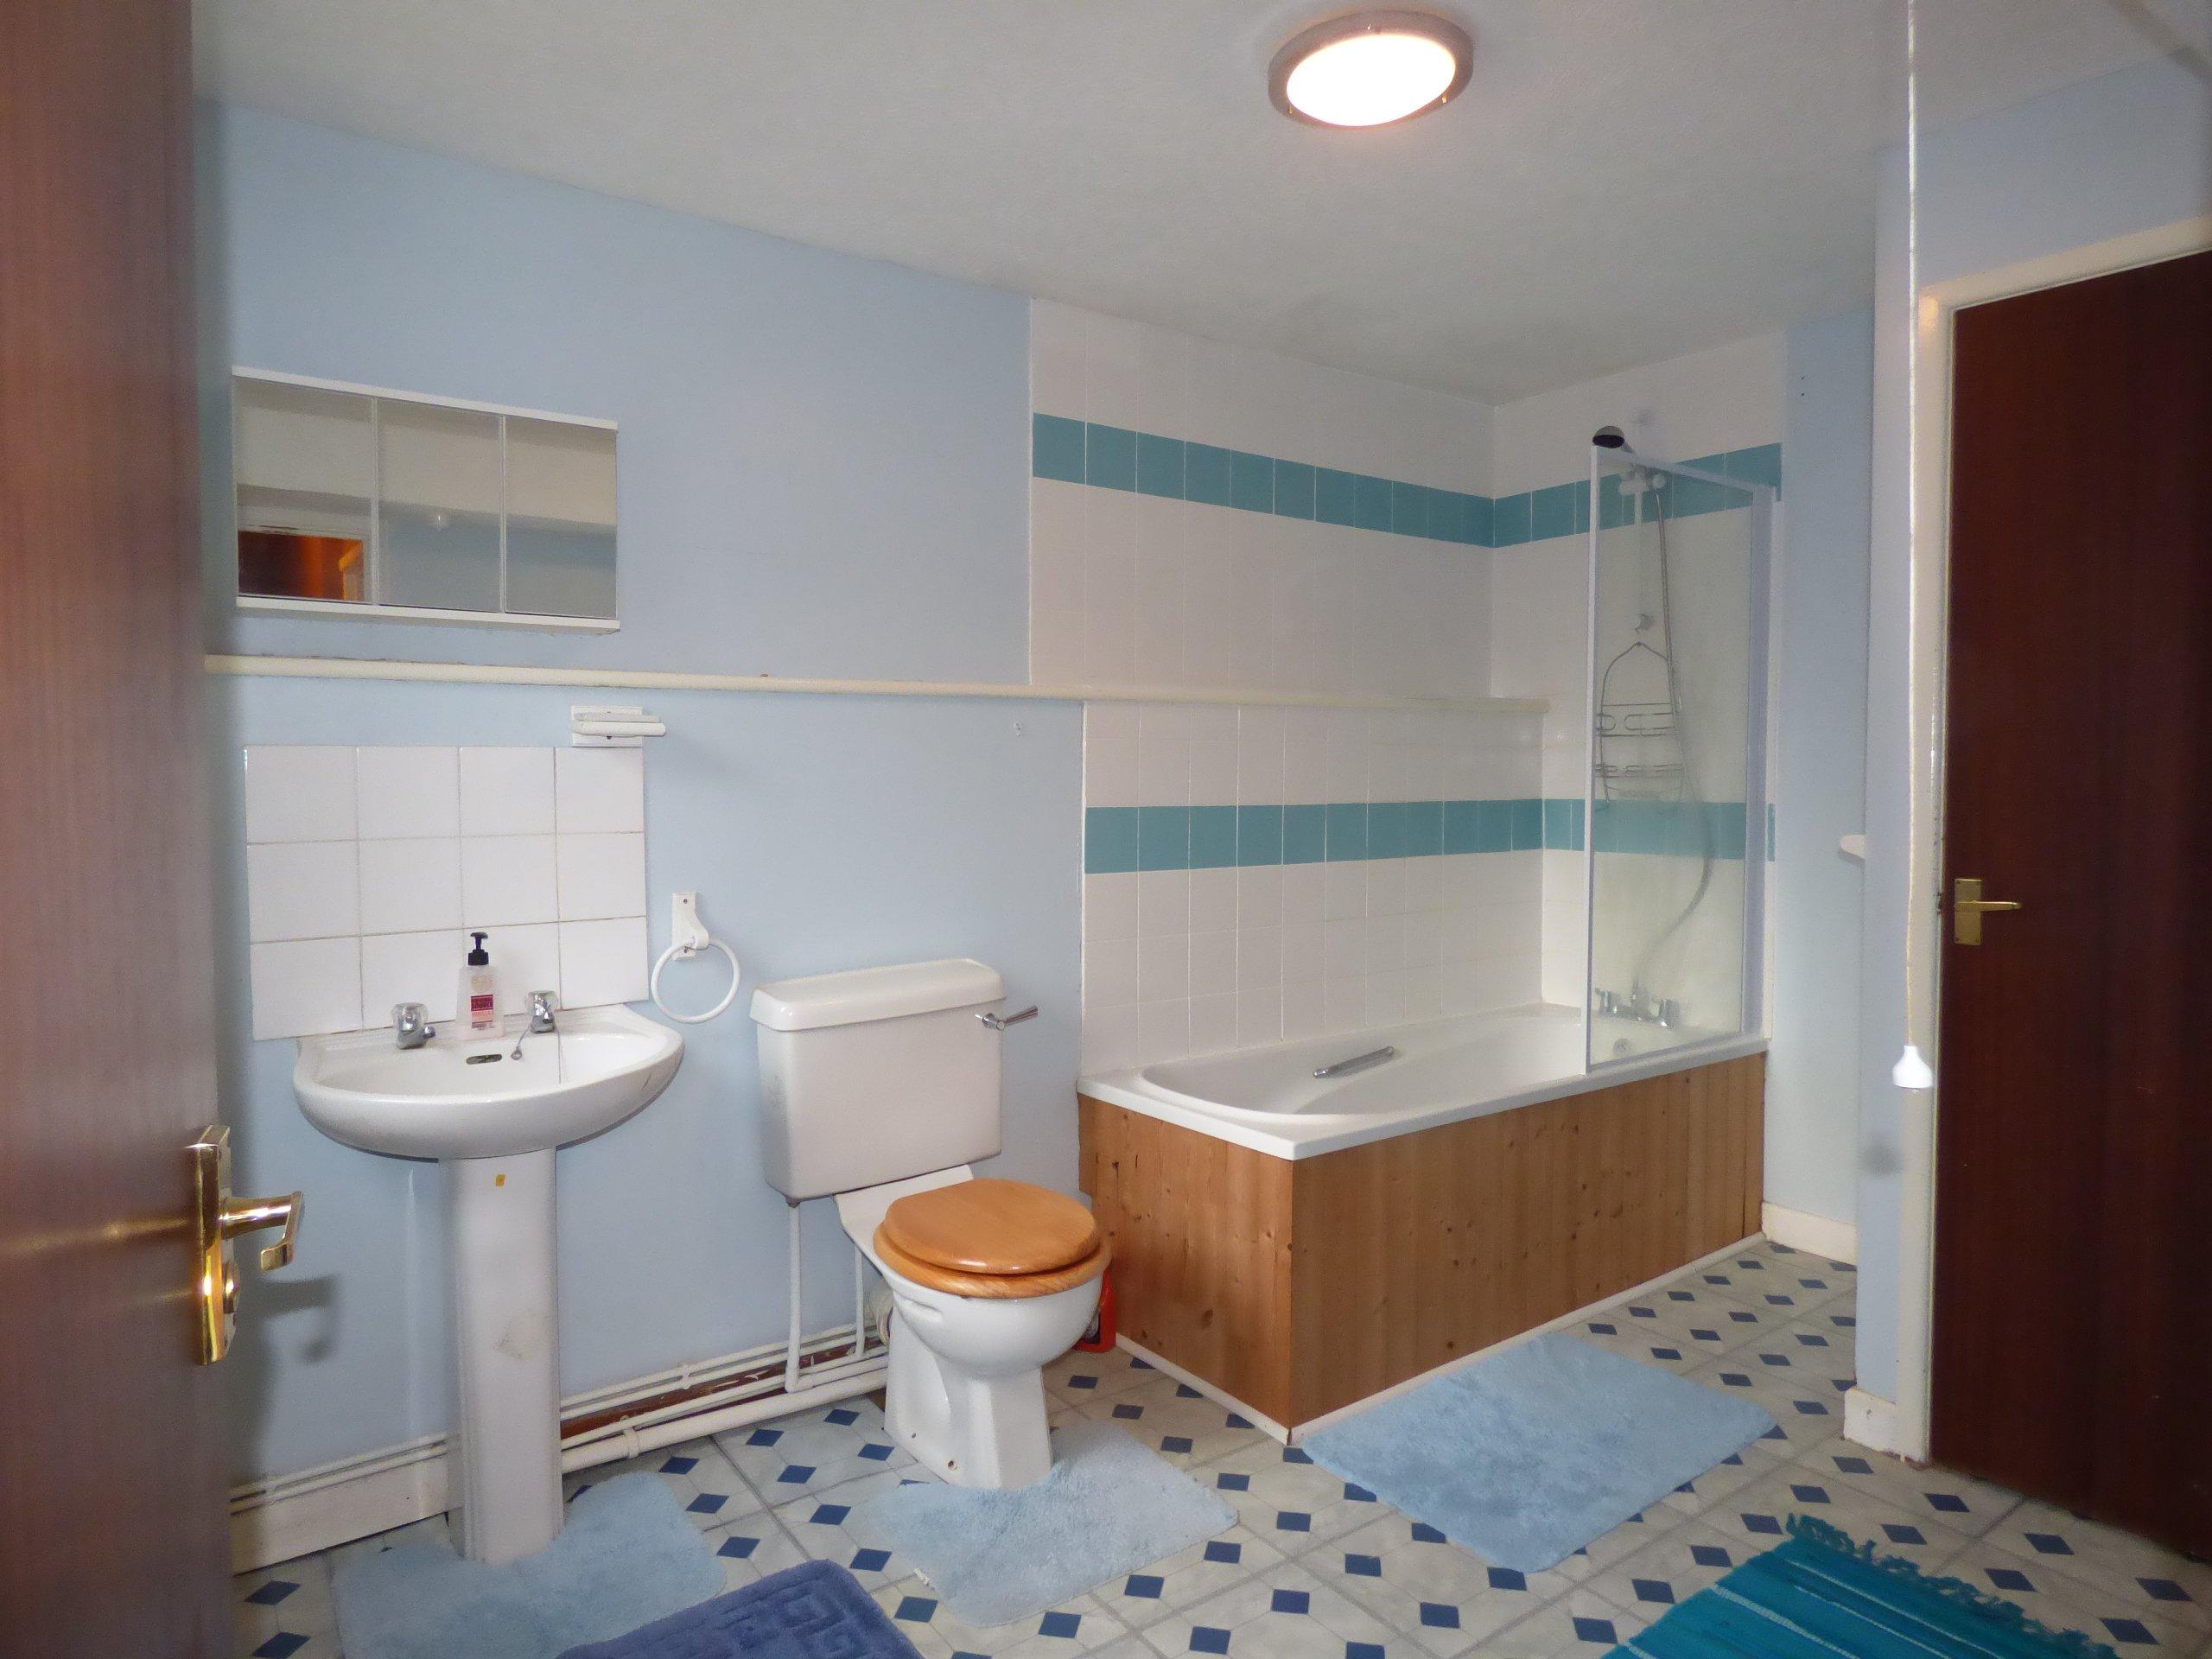 Wisemove. Property for sale. Bridgend Road, Pontycymer. Bathroom